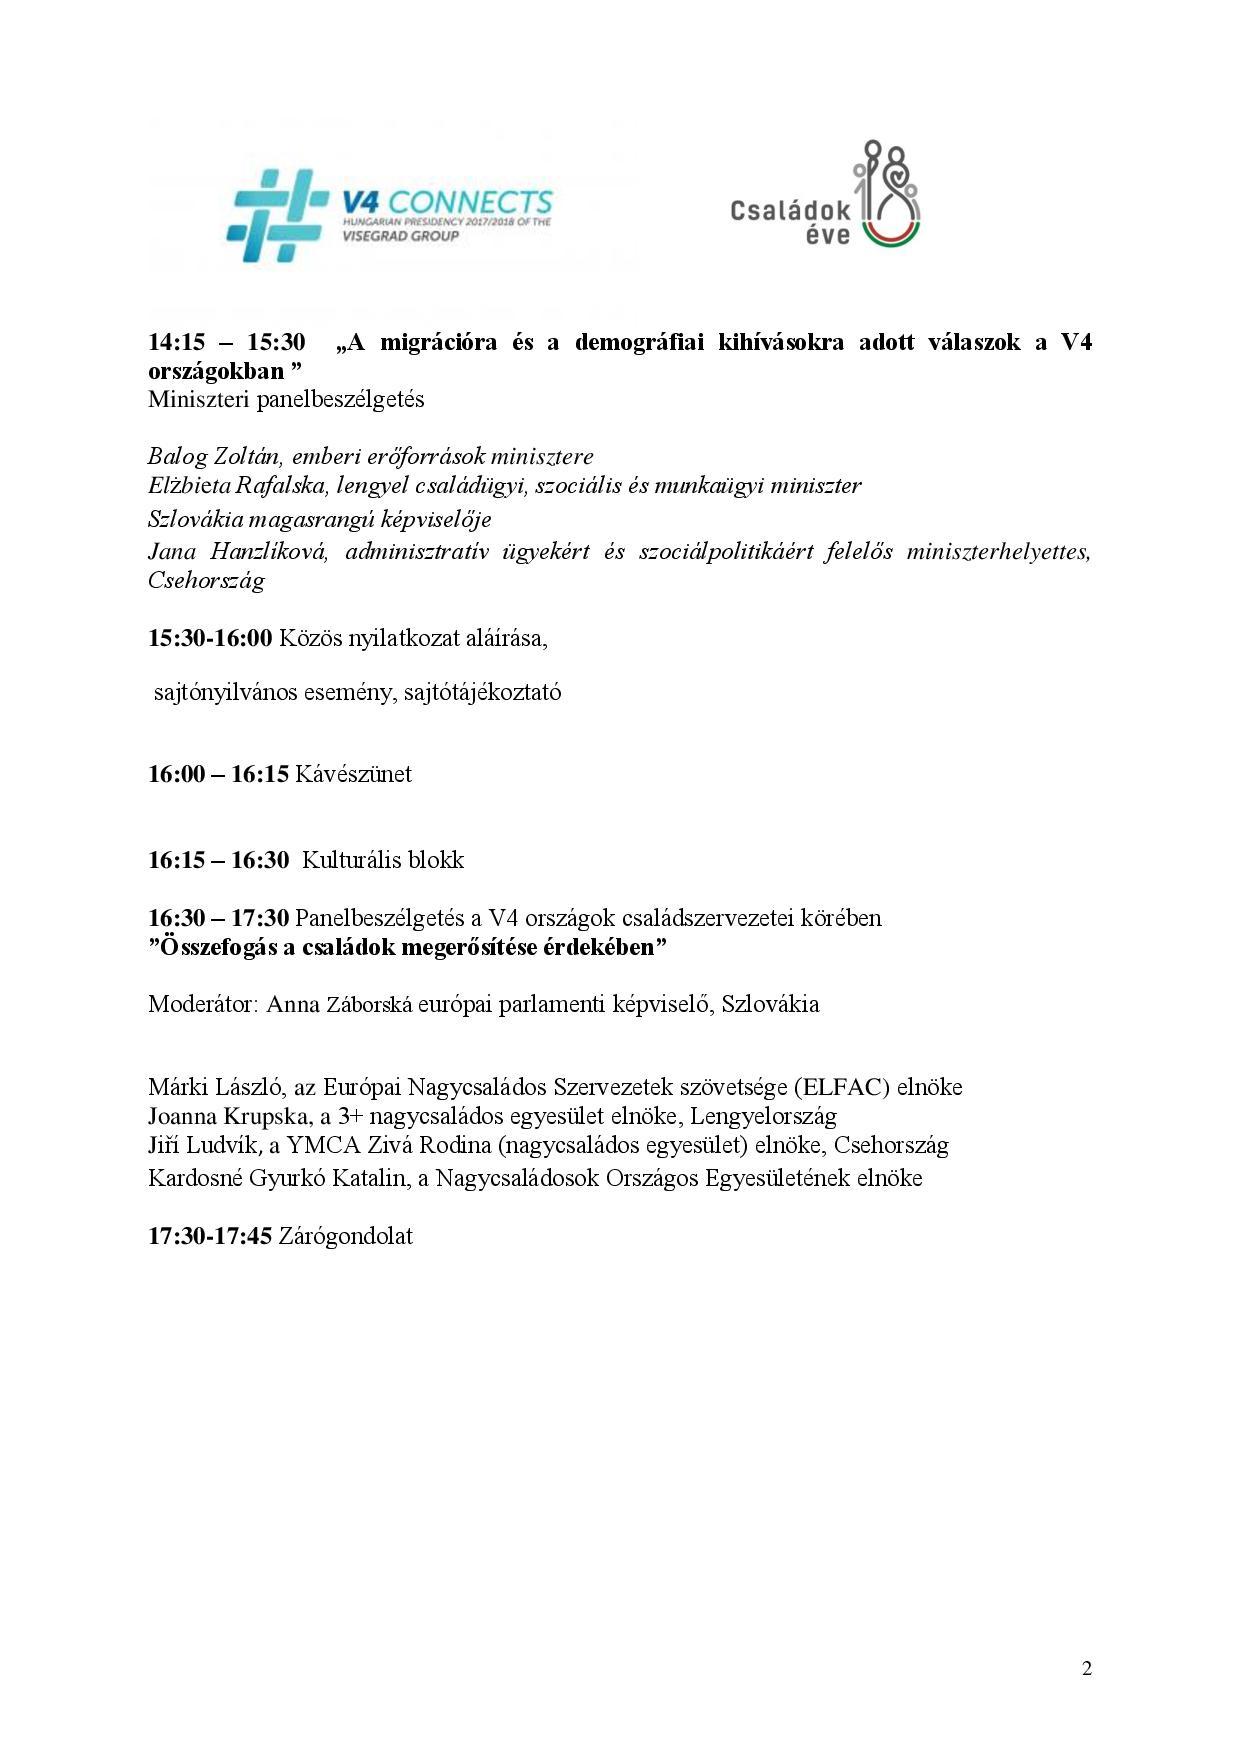 V4 Miniszteri Programterv Page 002